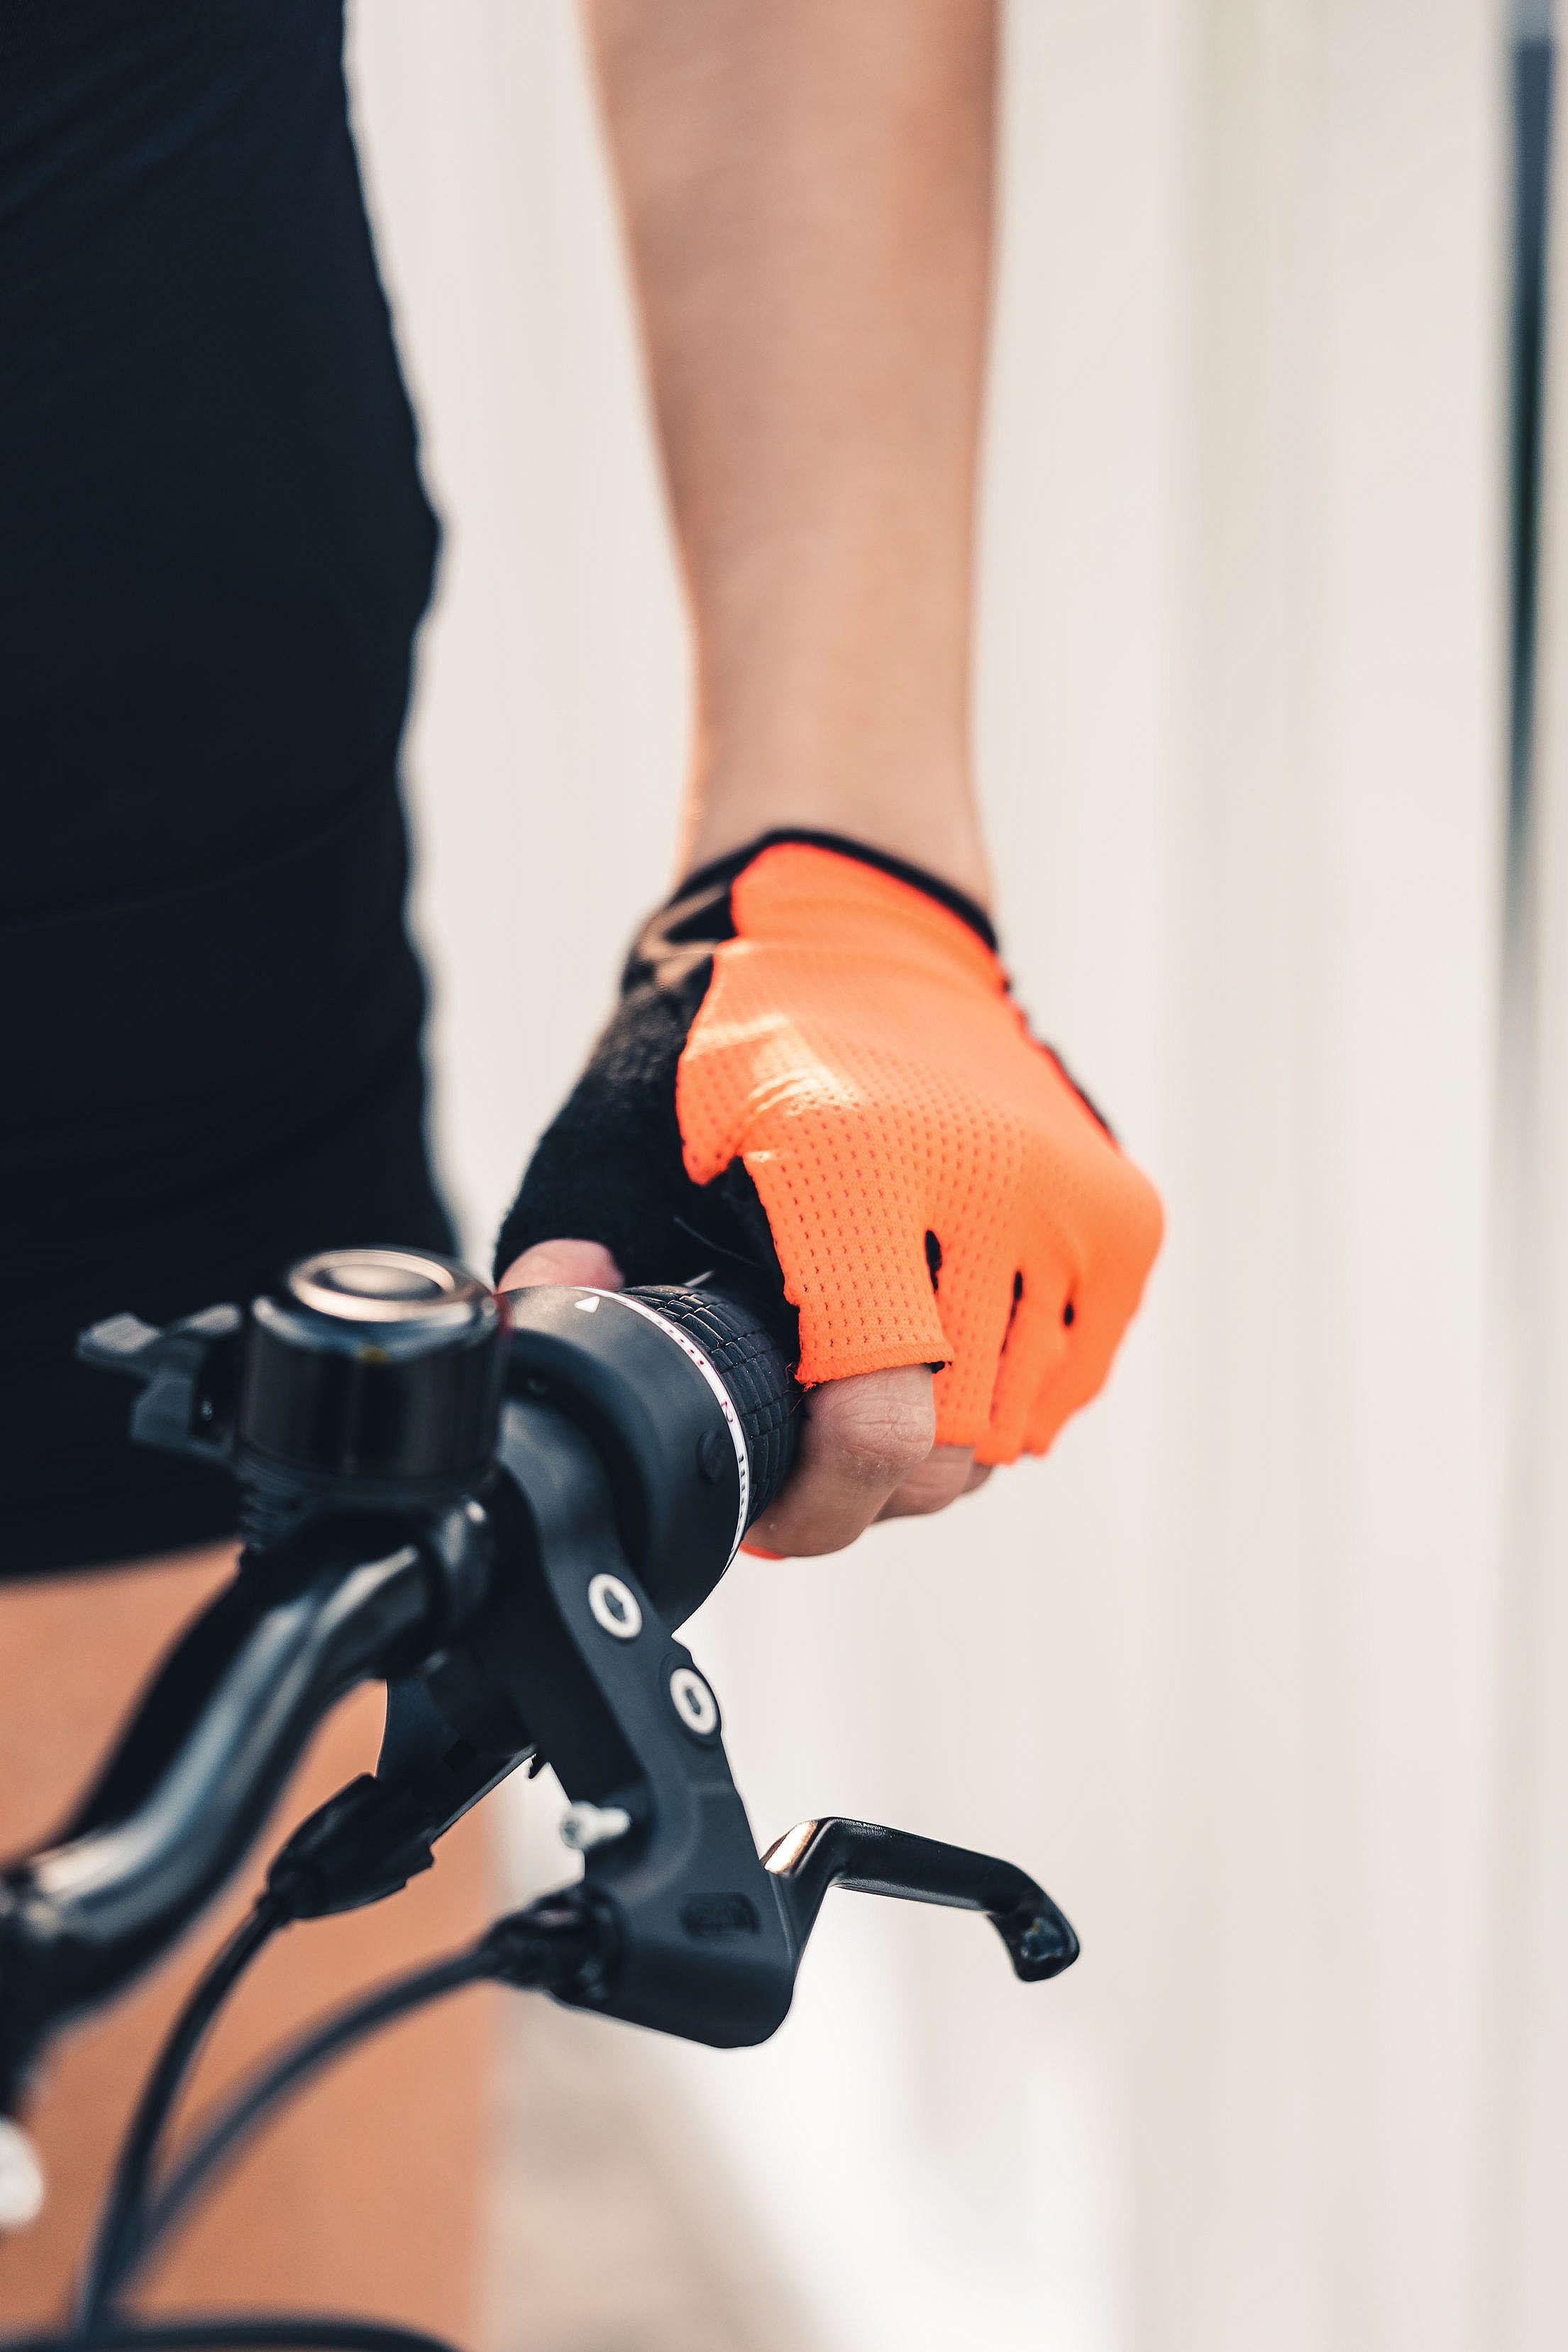 Woman Holding a Bicycle Handlebar Free Stock Photo